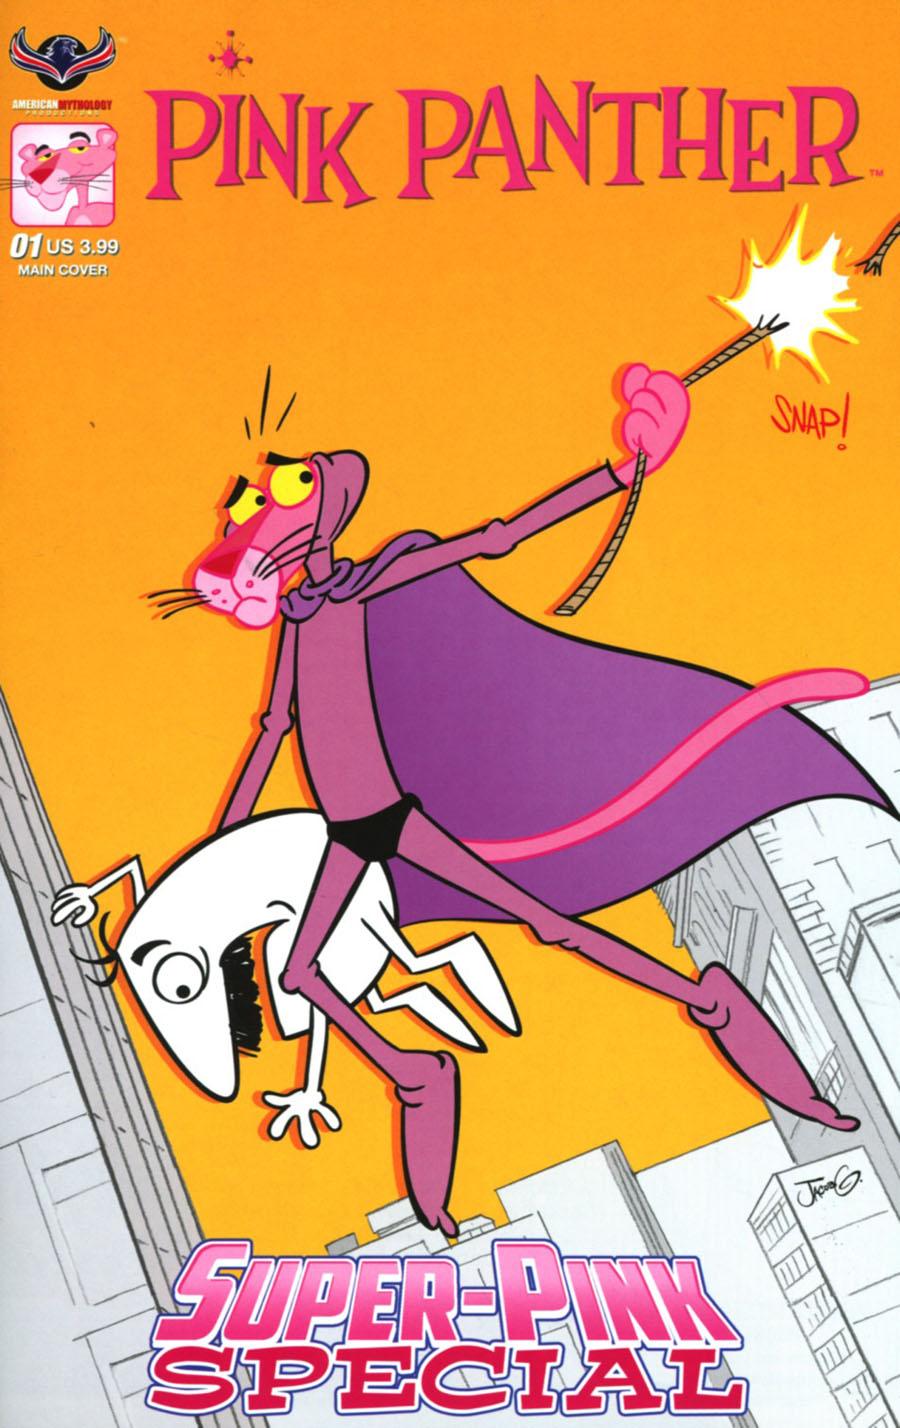 Pink Panther Super-Pink Special Cover A Regular Jacob Greenawalt Cover